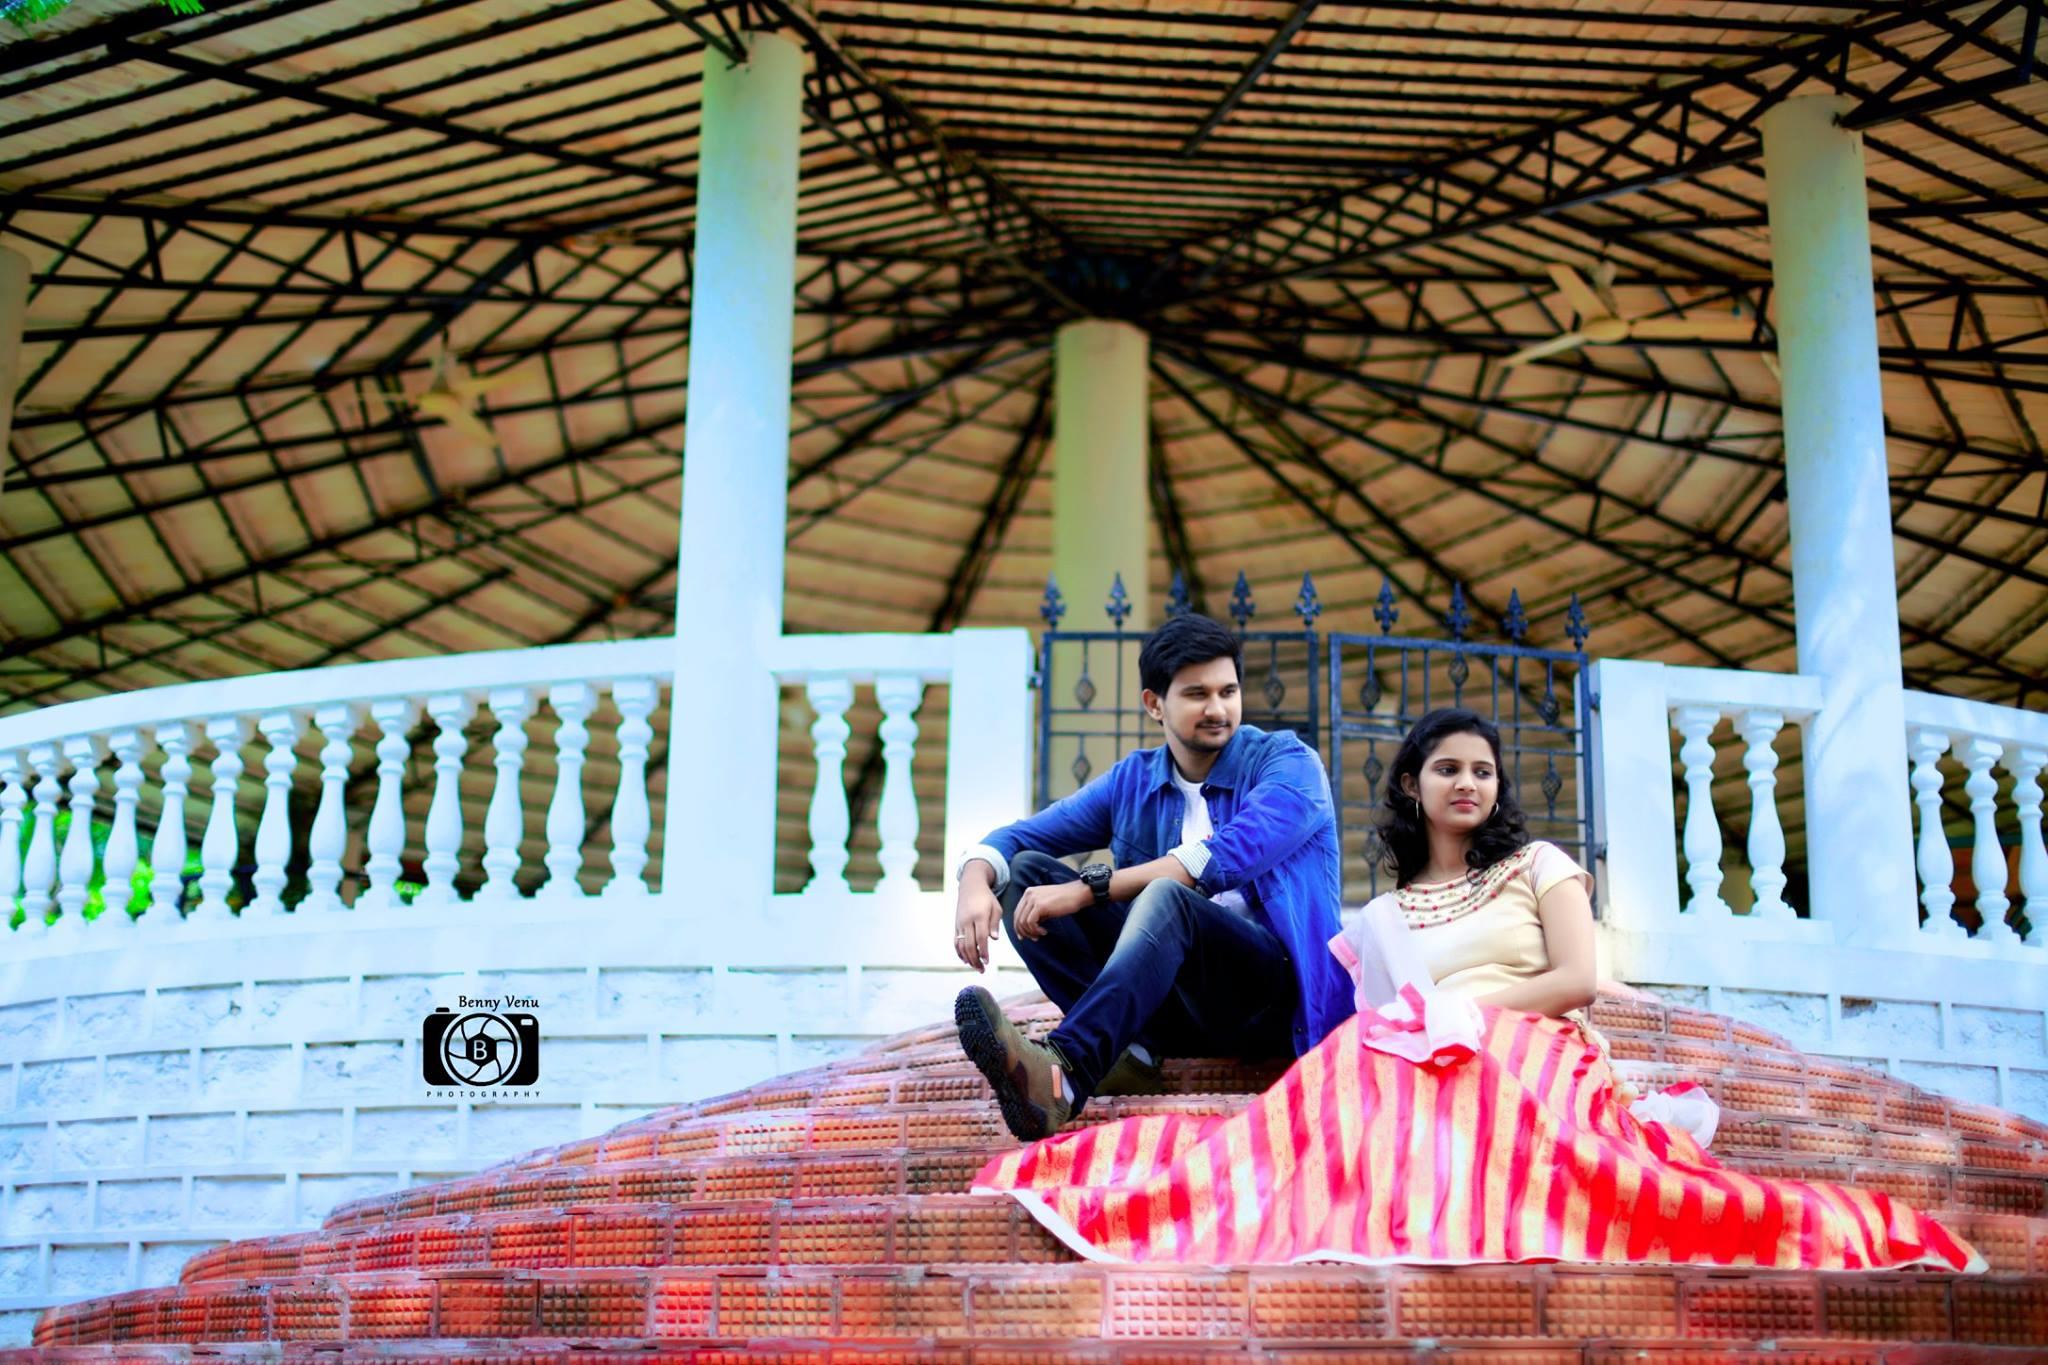 Romantic scene in stairs